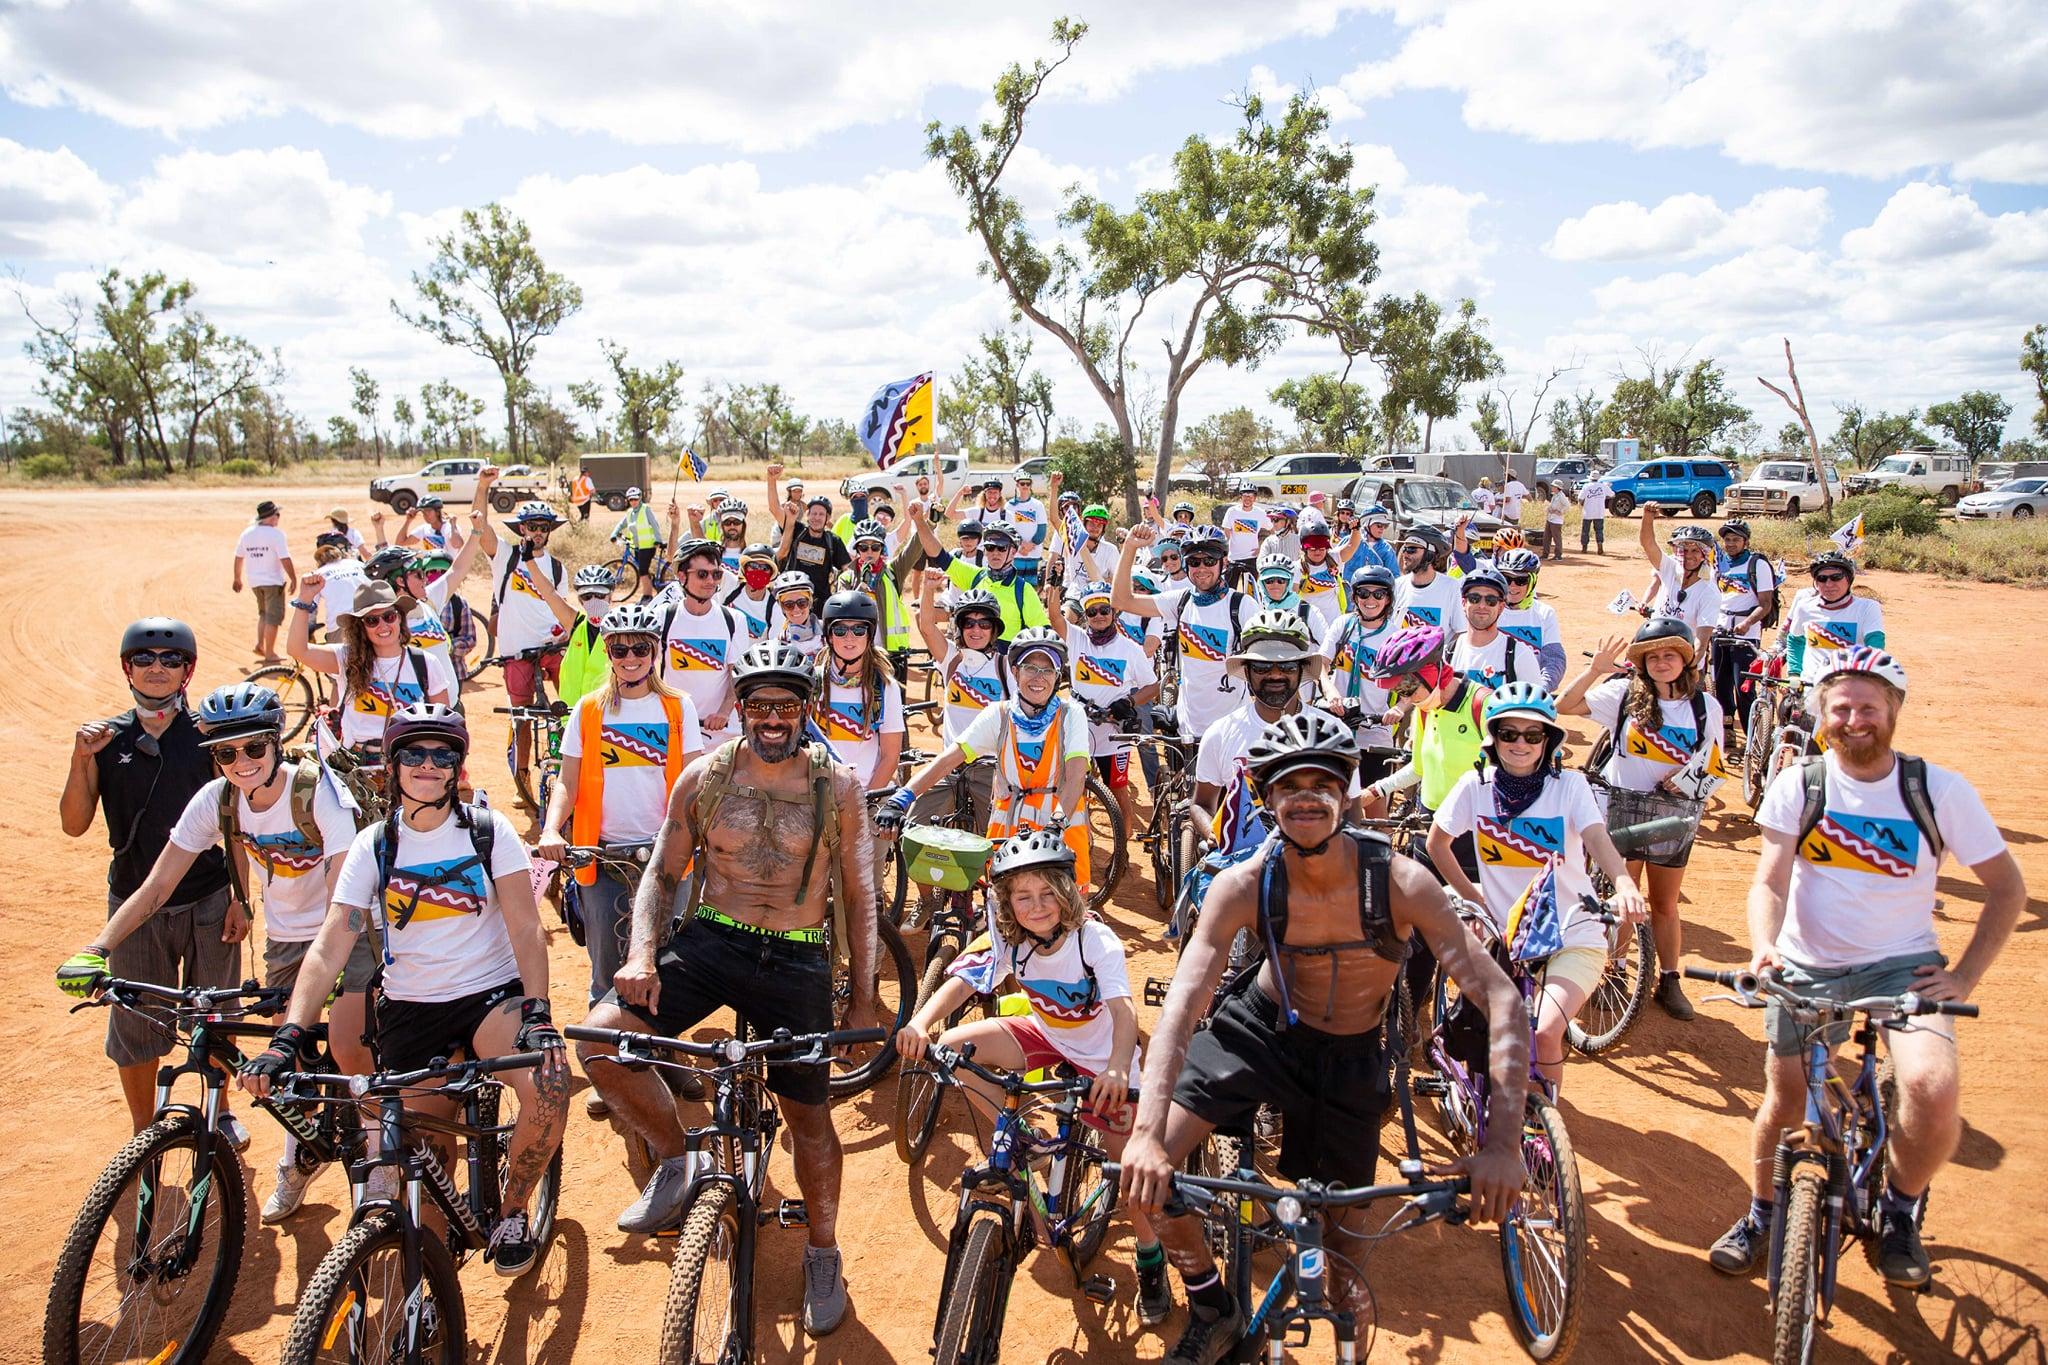 Launch of the 'Tour de Carmichael', a protest bike ride against Adani's coal project, May 2021